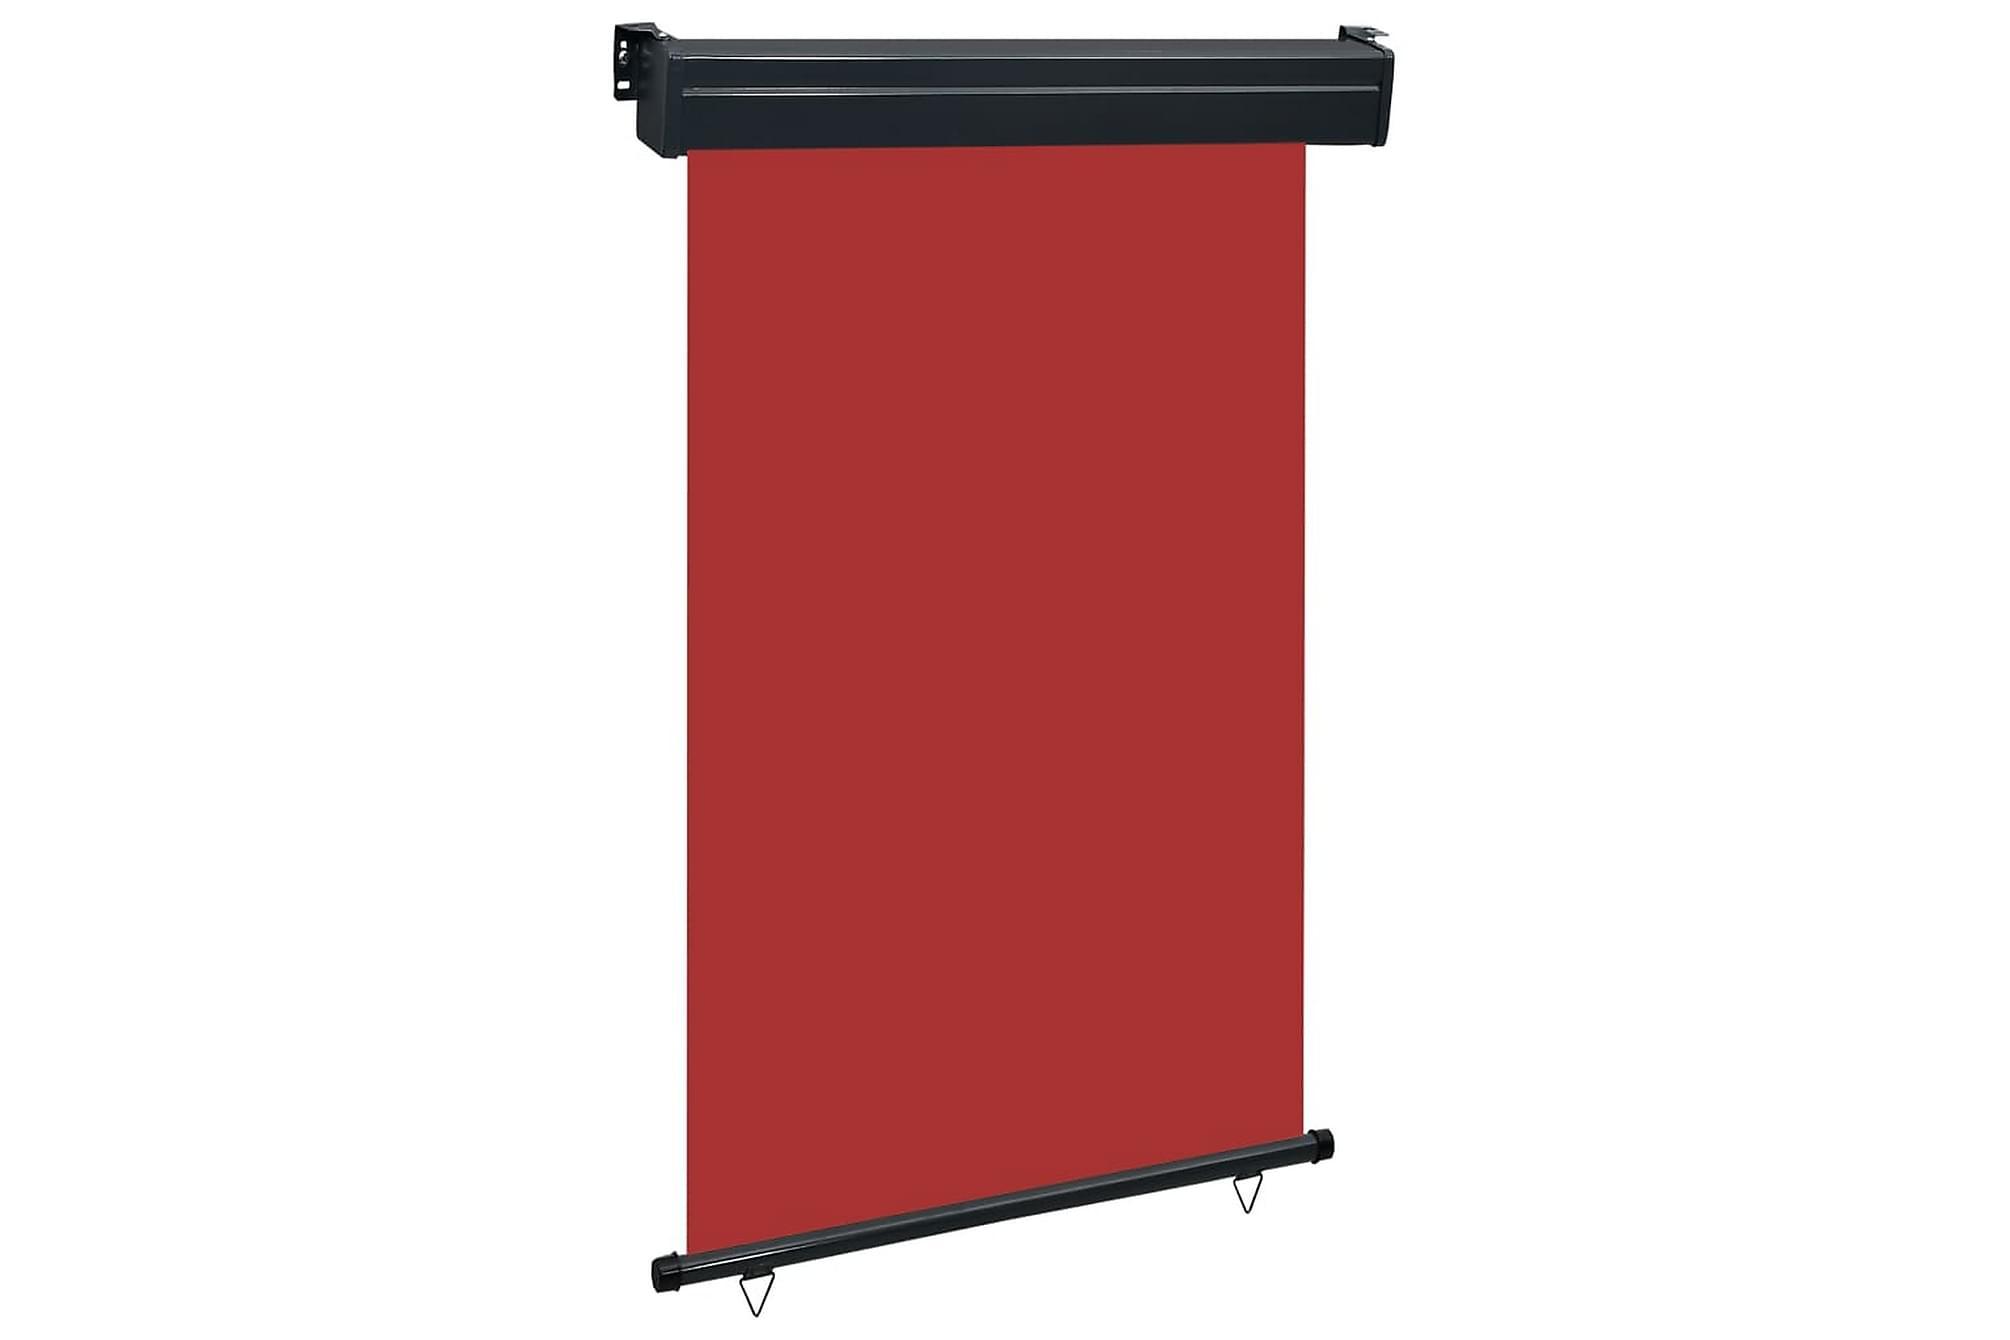 Balkongmarkis 120x250 cm röd, Markiser